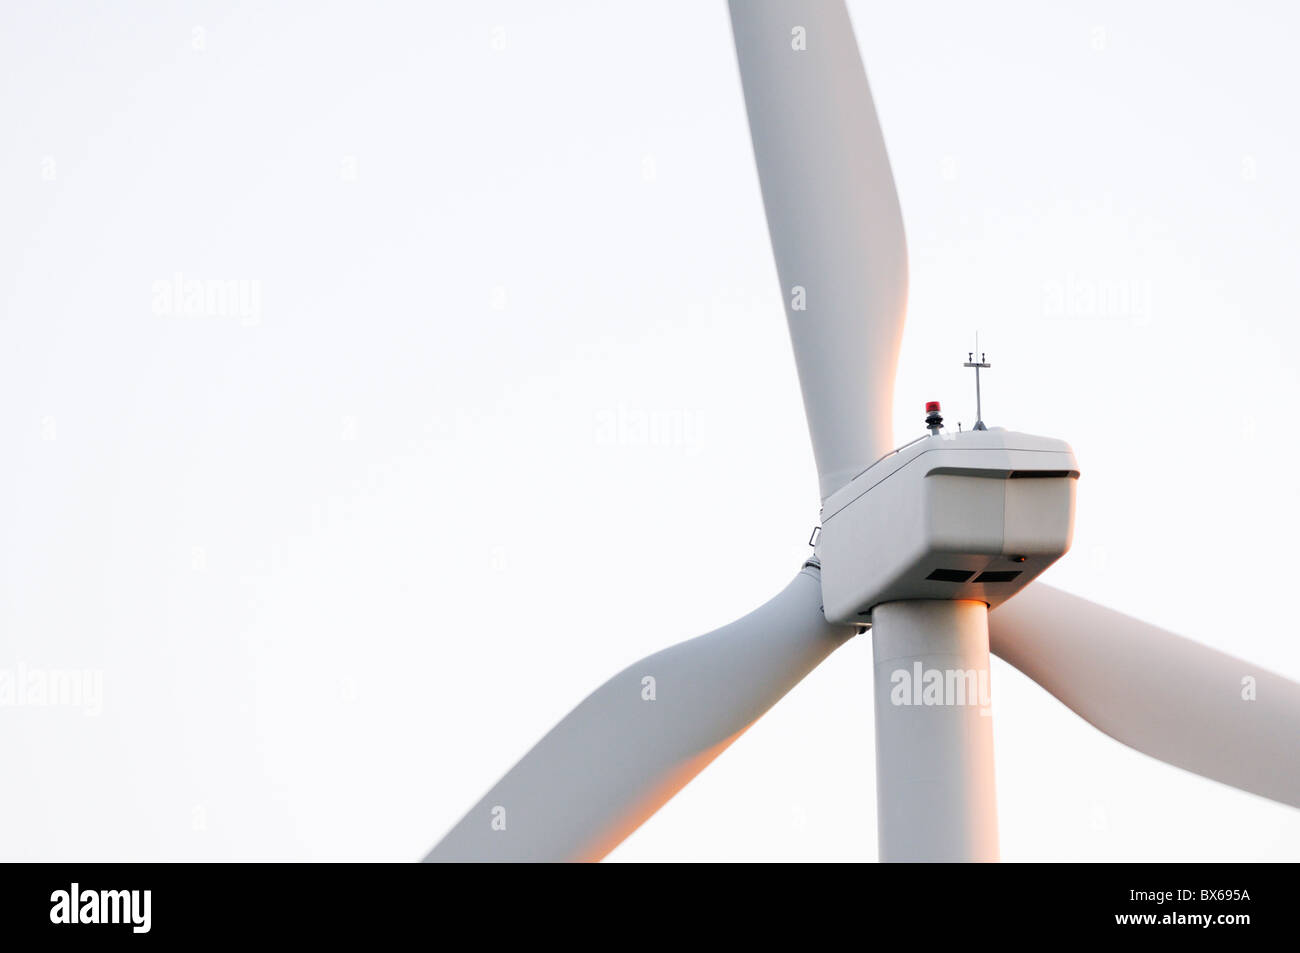 Wind turbine close-up - Stock Image